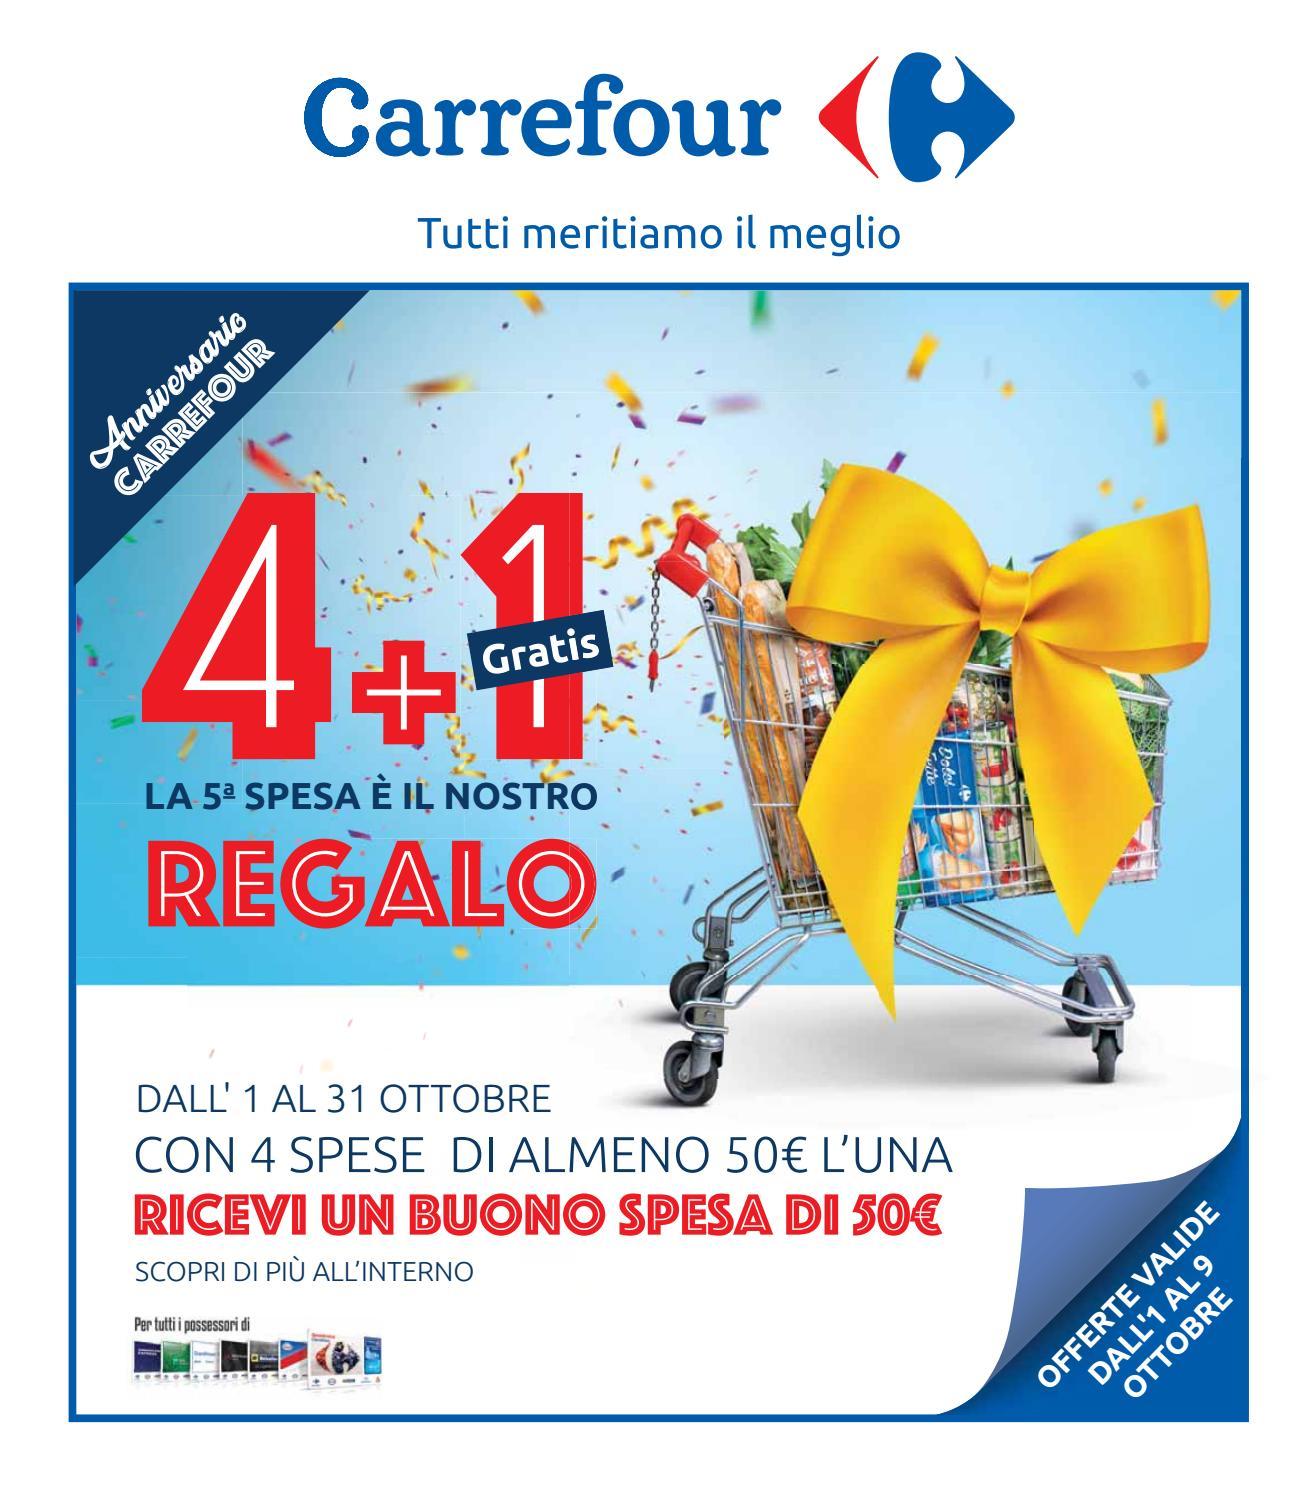 Materasso Gonfiabile Matrimoniale Carrefour.Carrefour 9ott By Best Of Volantinoweb Issuu